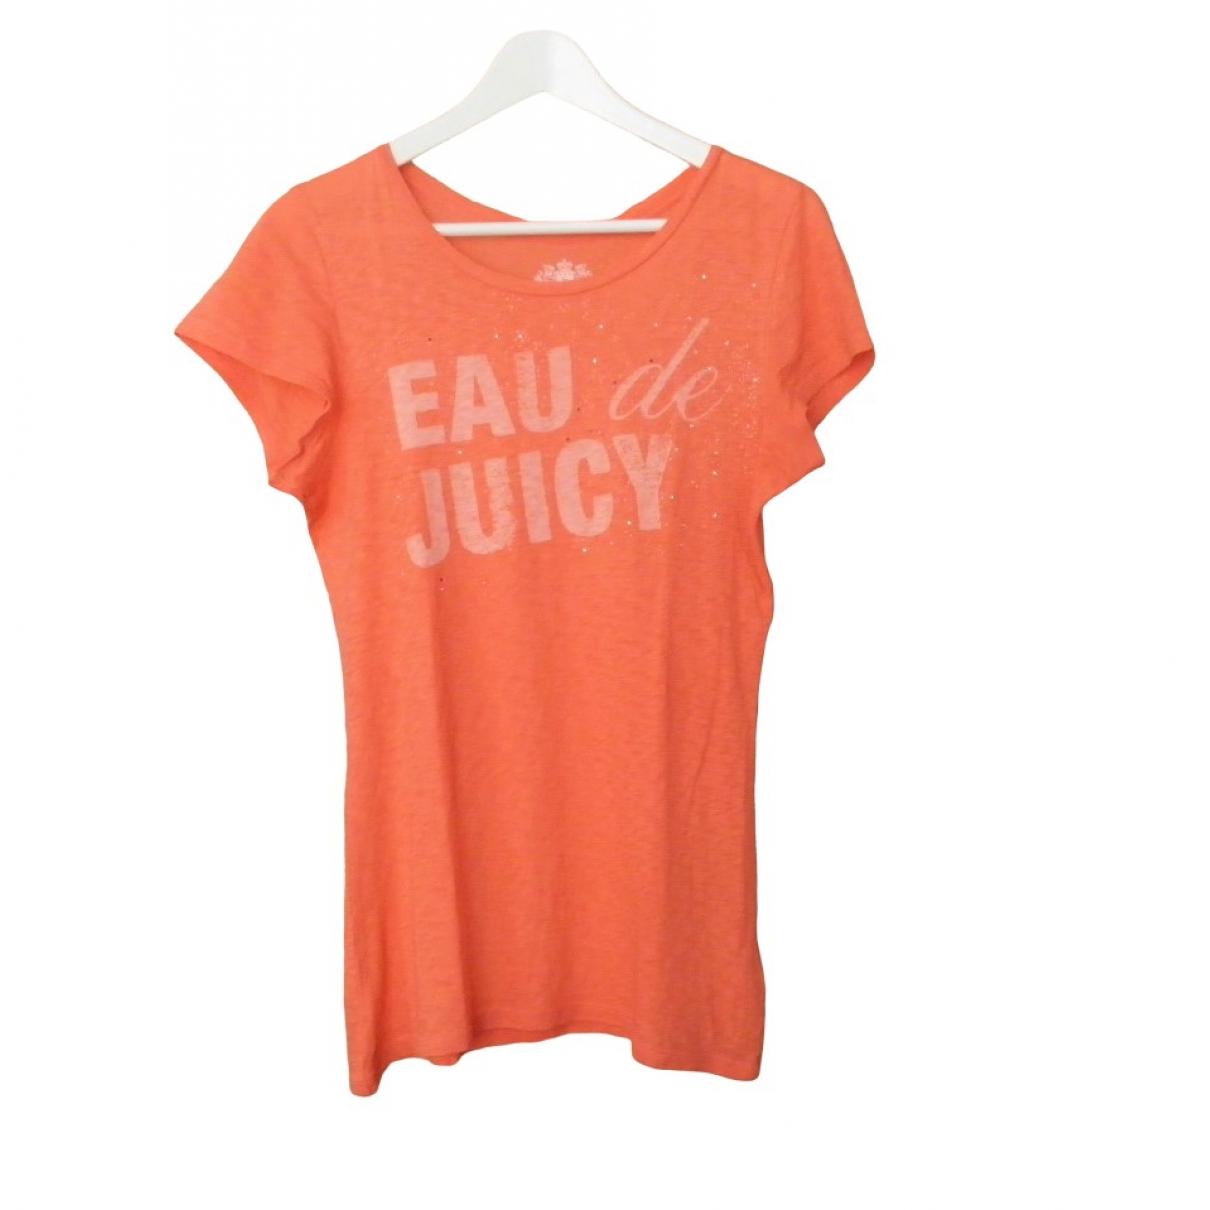 Juicy Couture \N Orange Cotton  top for Women M International